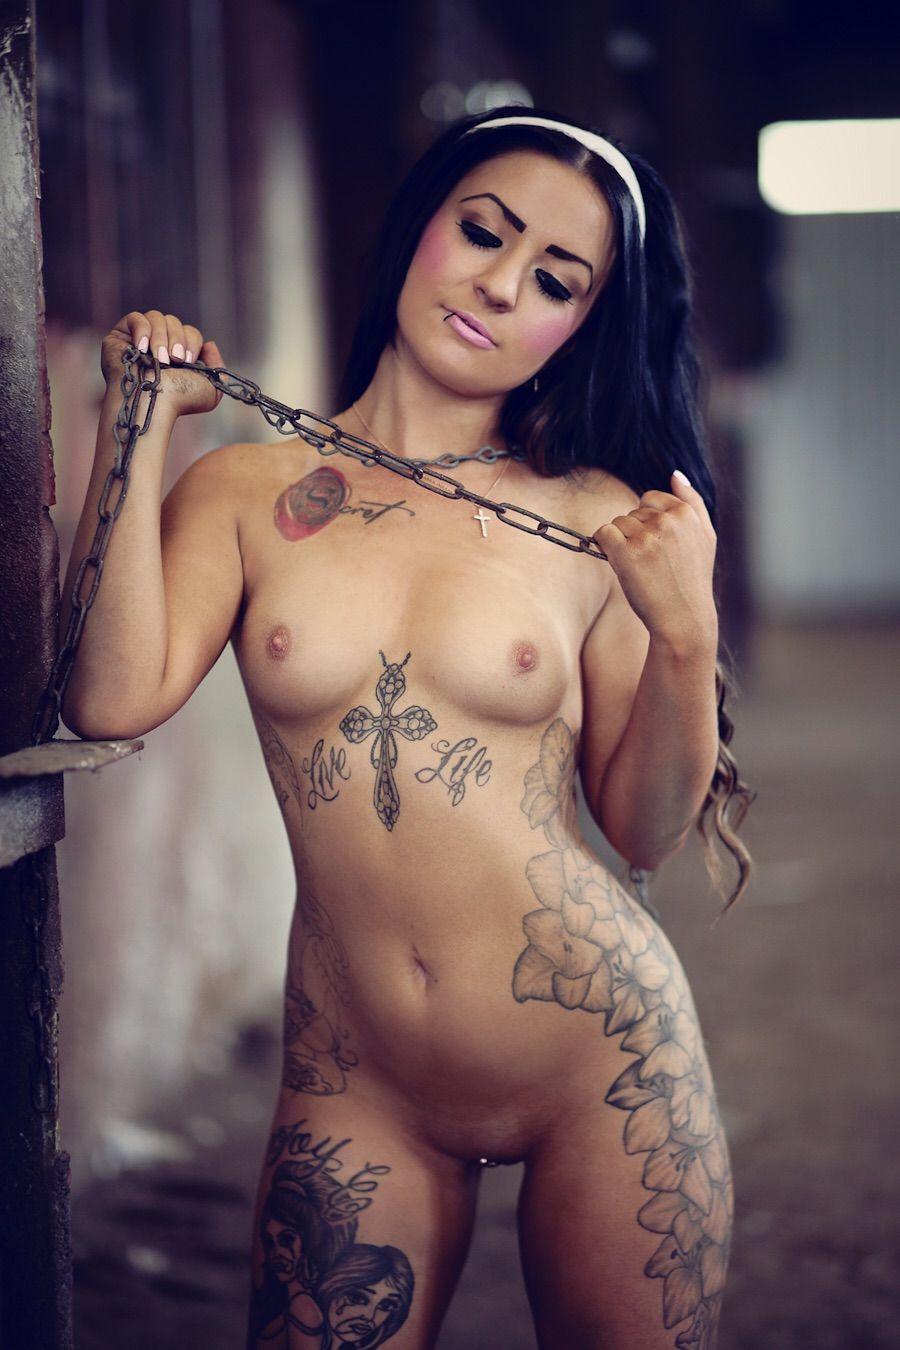 Pin By Yalle Tawalla On Tato Vagina  Pinterest  Tattoo Female, Nice -5858